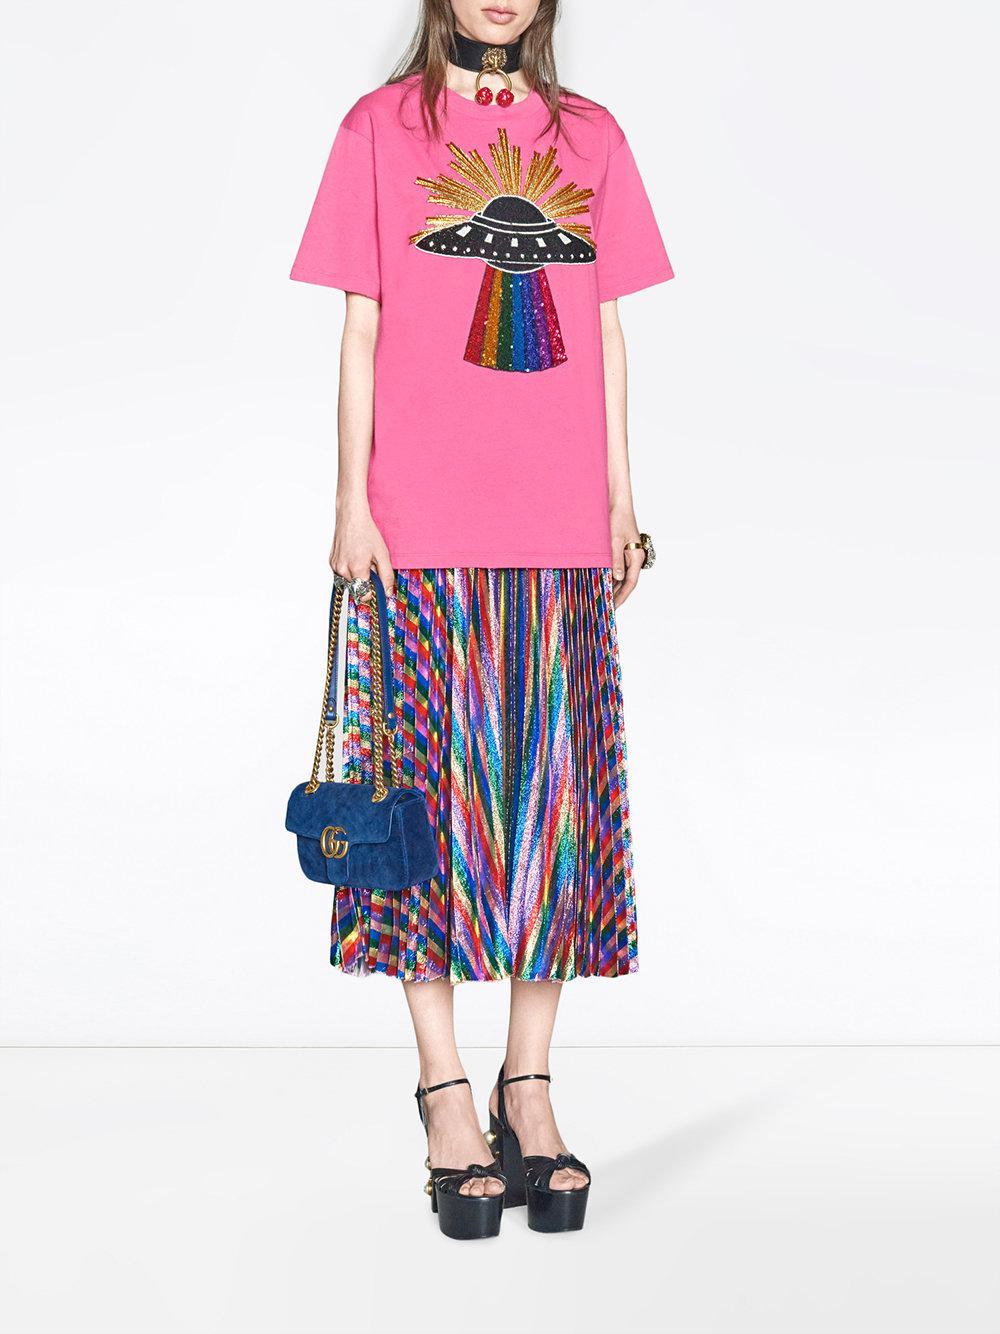 ae43b3a2e3a1 Lyst - Gucci GG Marmont Velvet Mini Bag in Blue - Save 12%